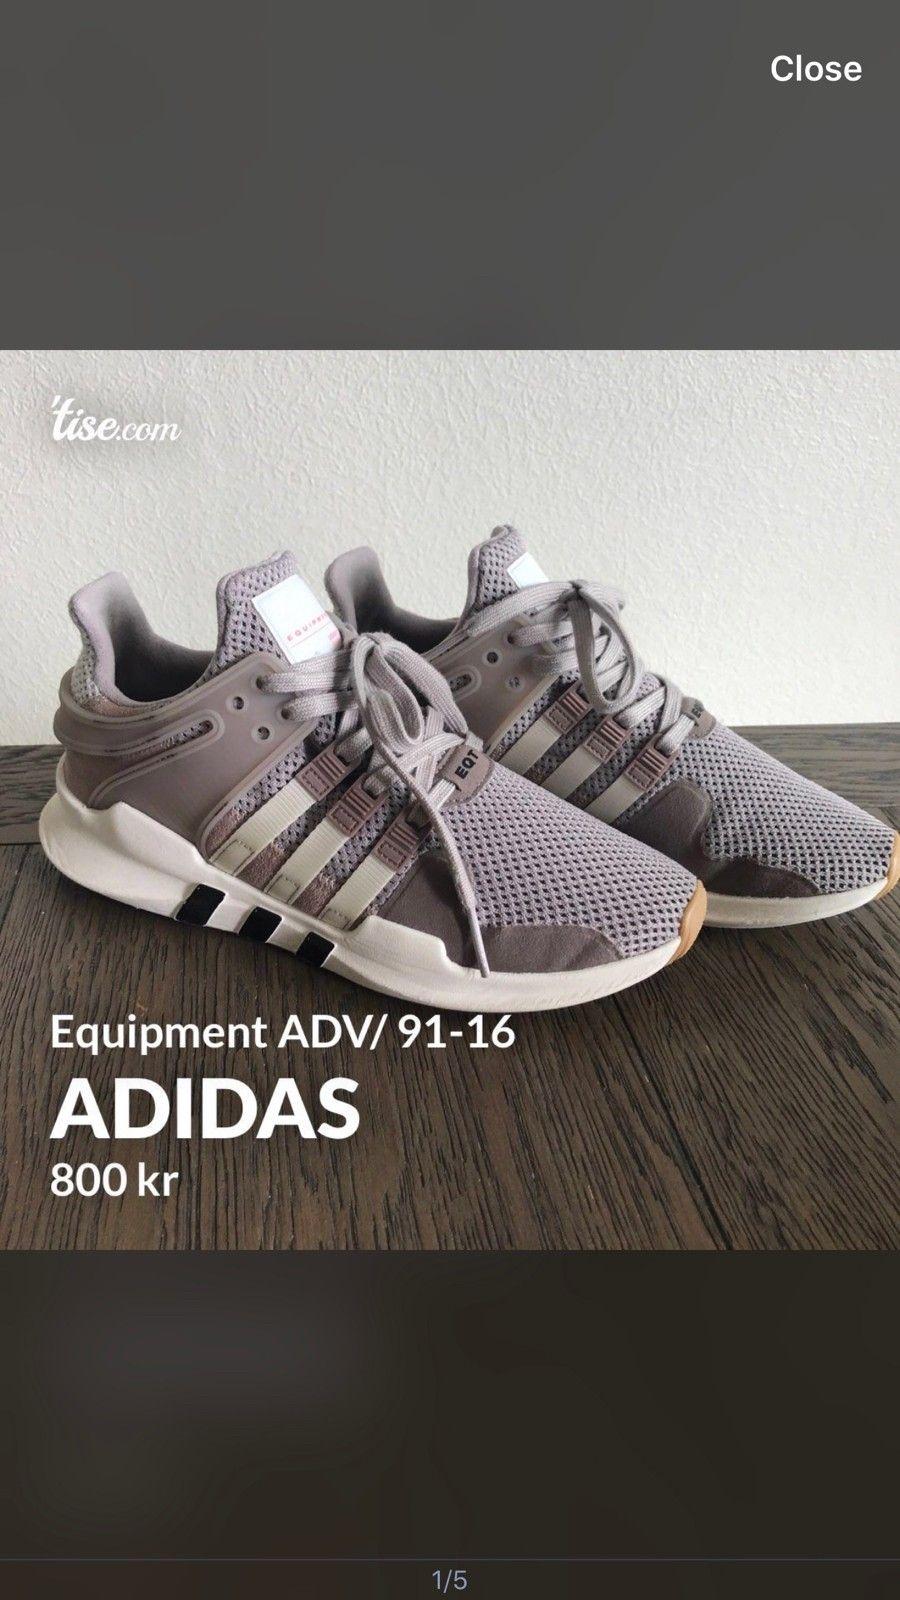 Nye Adidas Equipment sko selges, str 11 (UK).   FINN.no